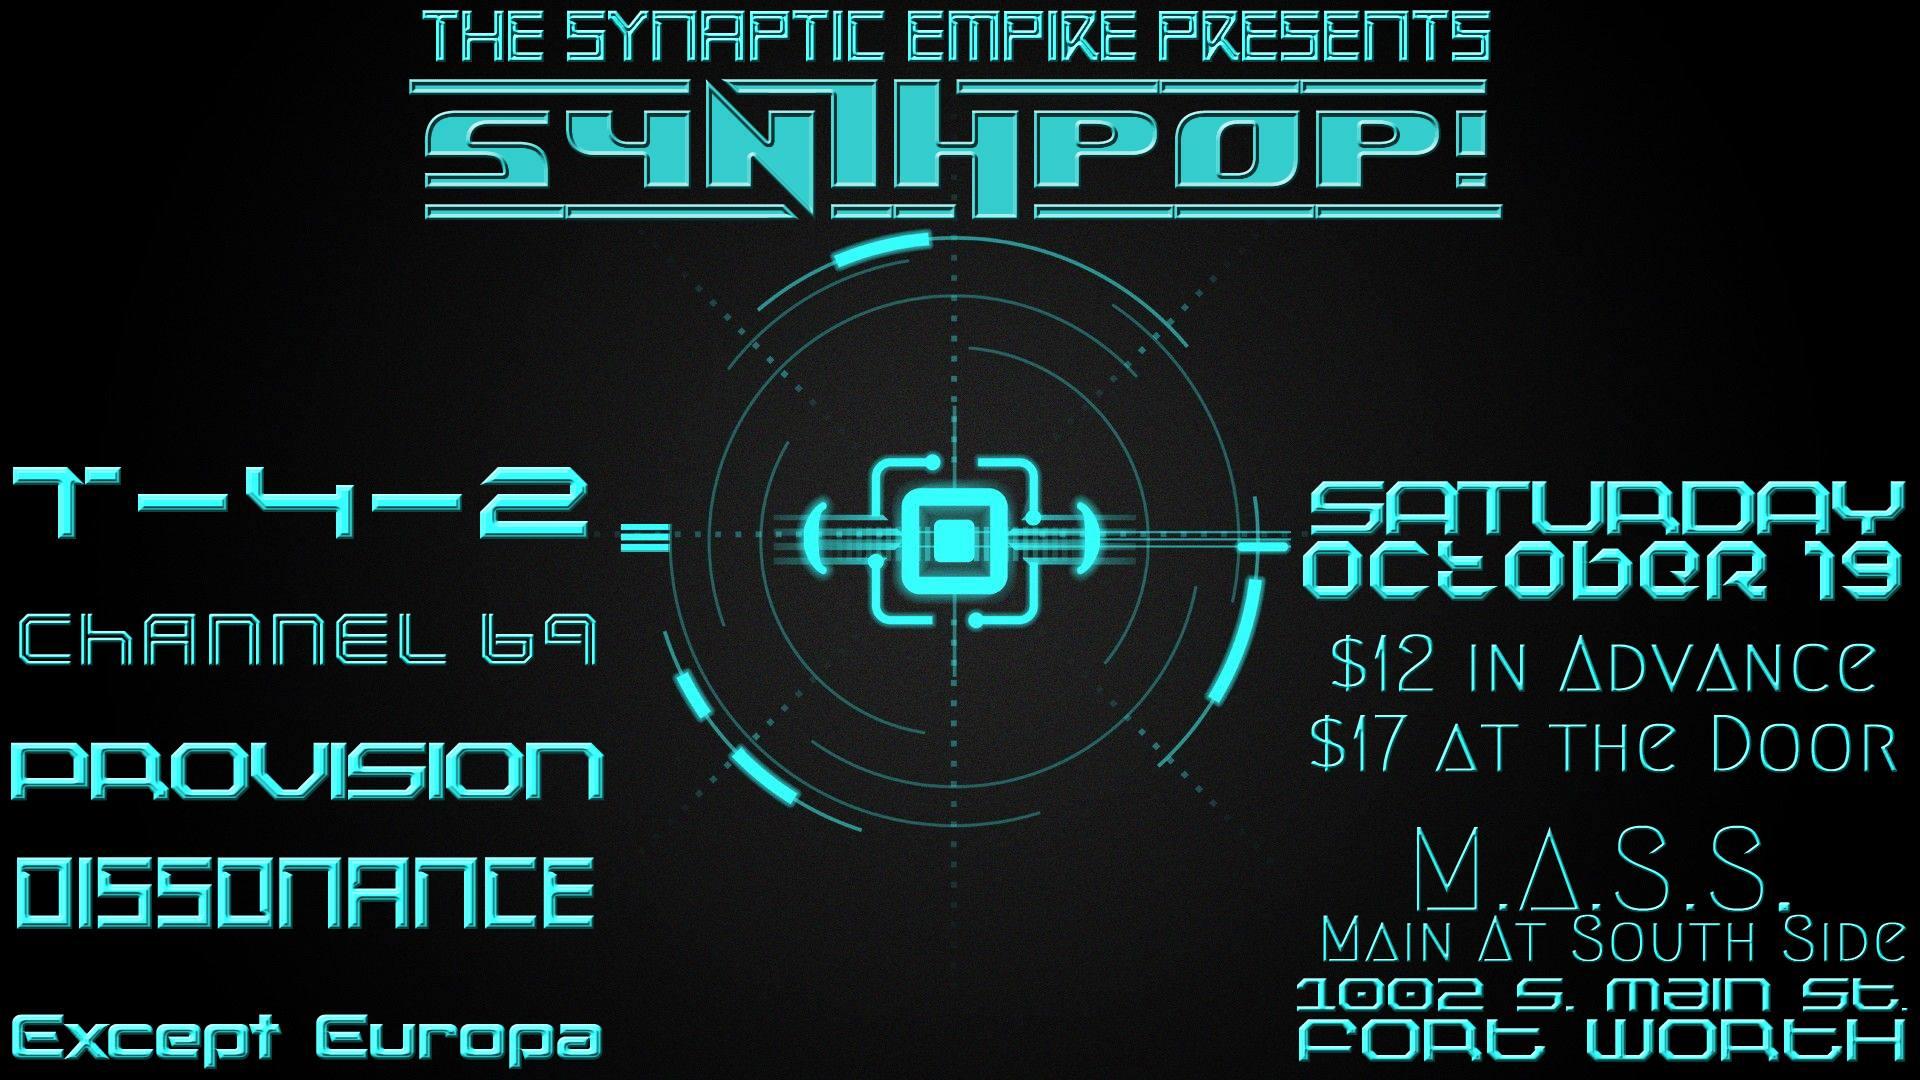 TSE: Synthpop!